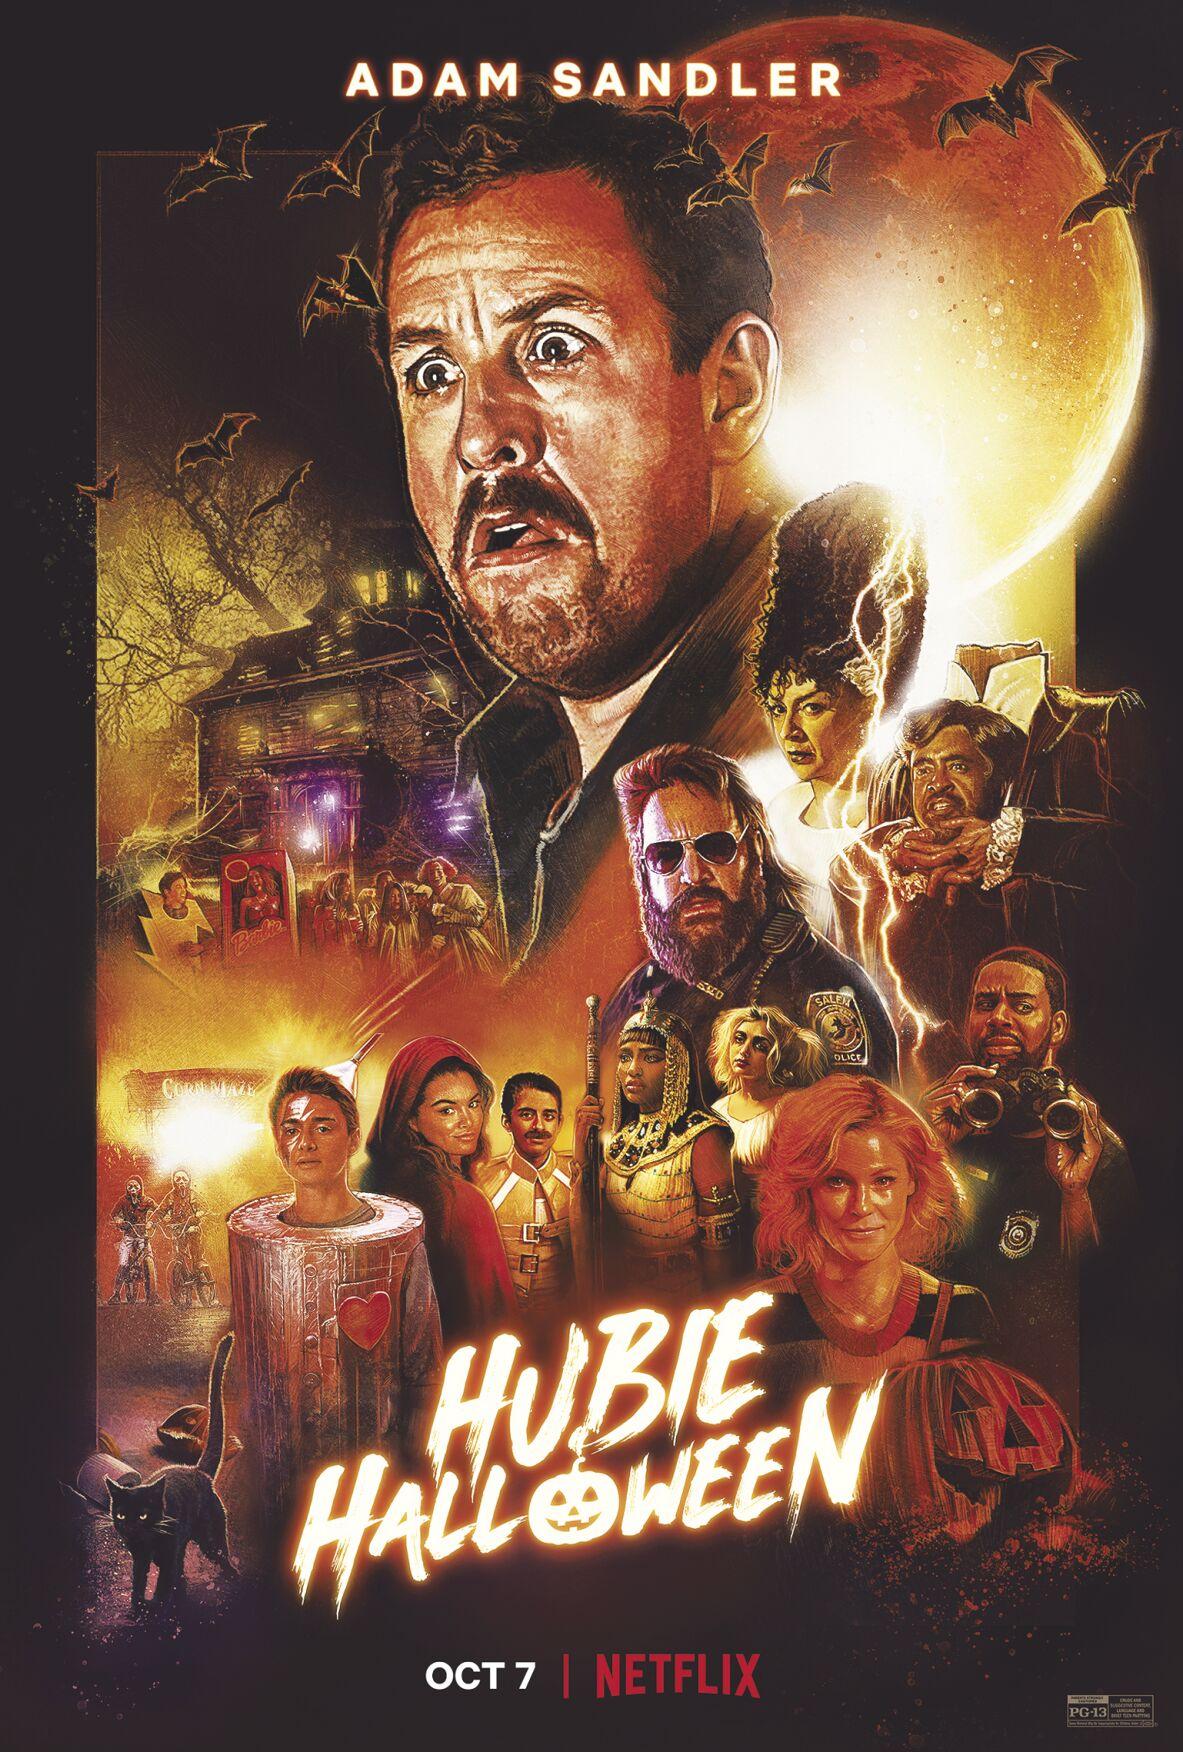 10-16-2020 Hubie Halloween